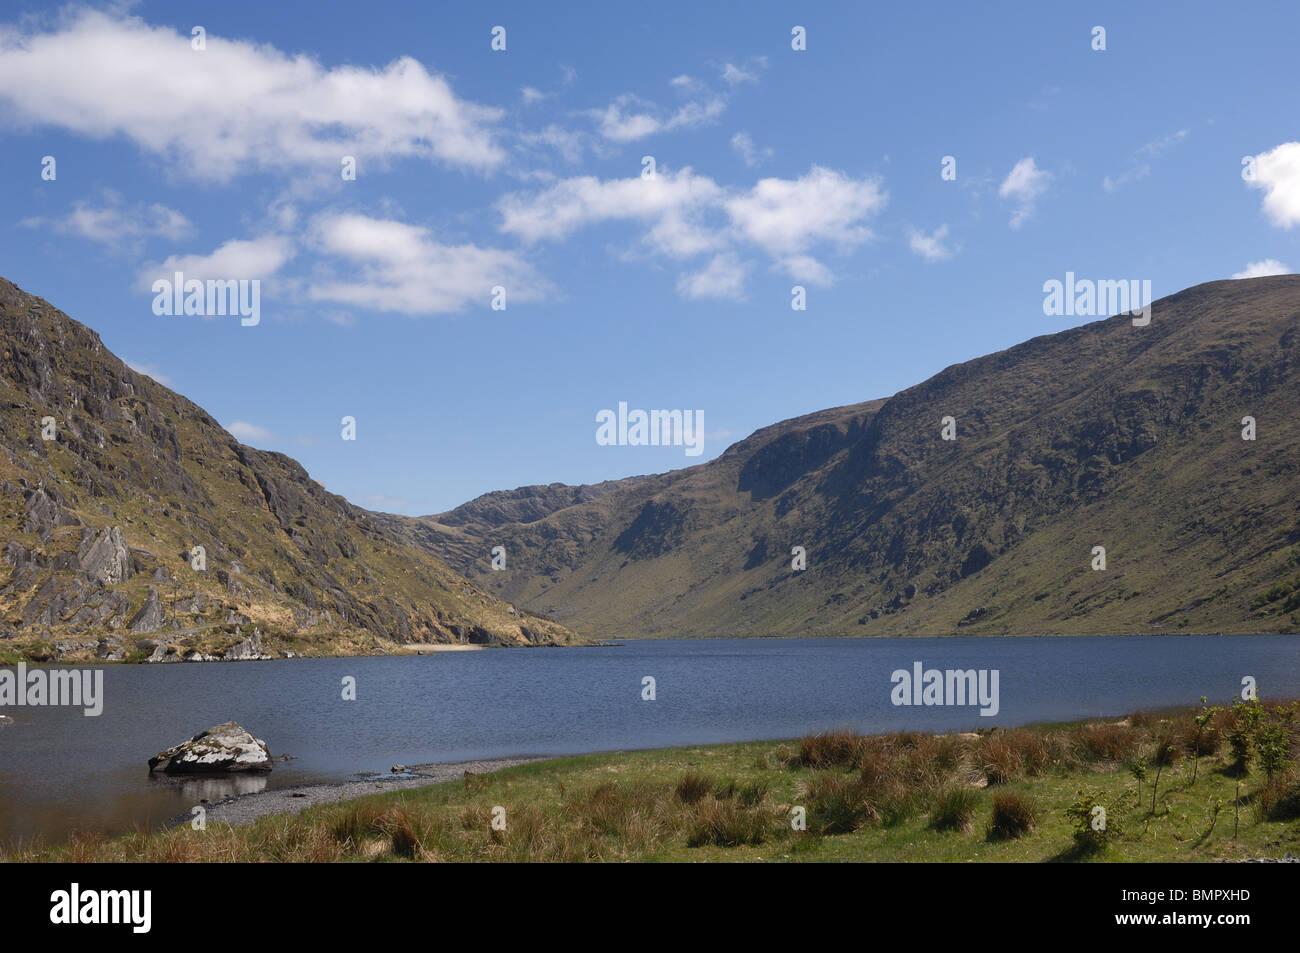 Glenbeg Lake, County Cork, Ireland - John Gollop - Stock Image